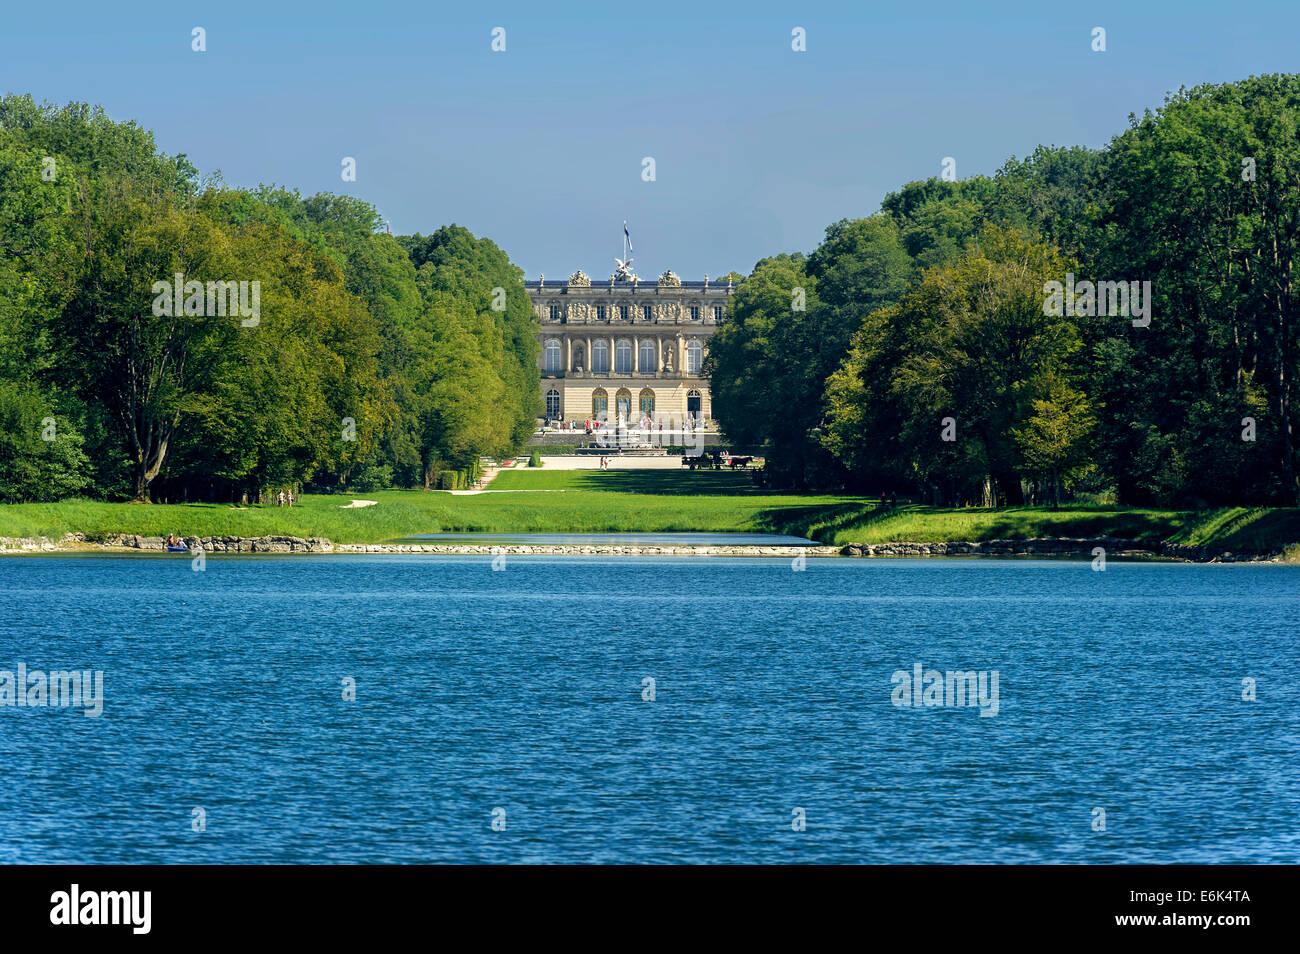 Herrenchiemsee New Palace, Schlosspark palace gardens, Herreninsel island, Chiemsee lake, Chiemgau, Upper Bavaria, - Stock Image